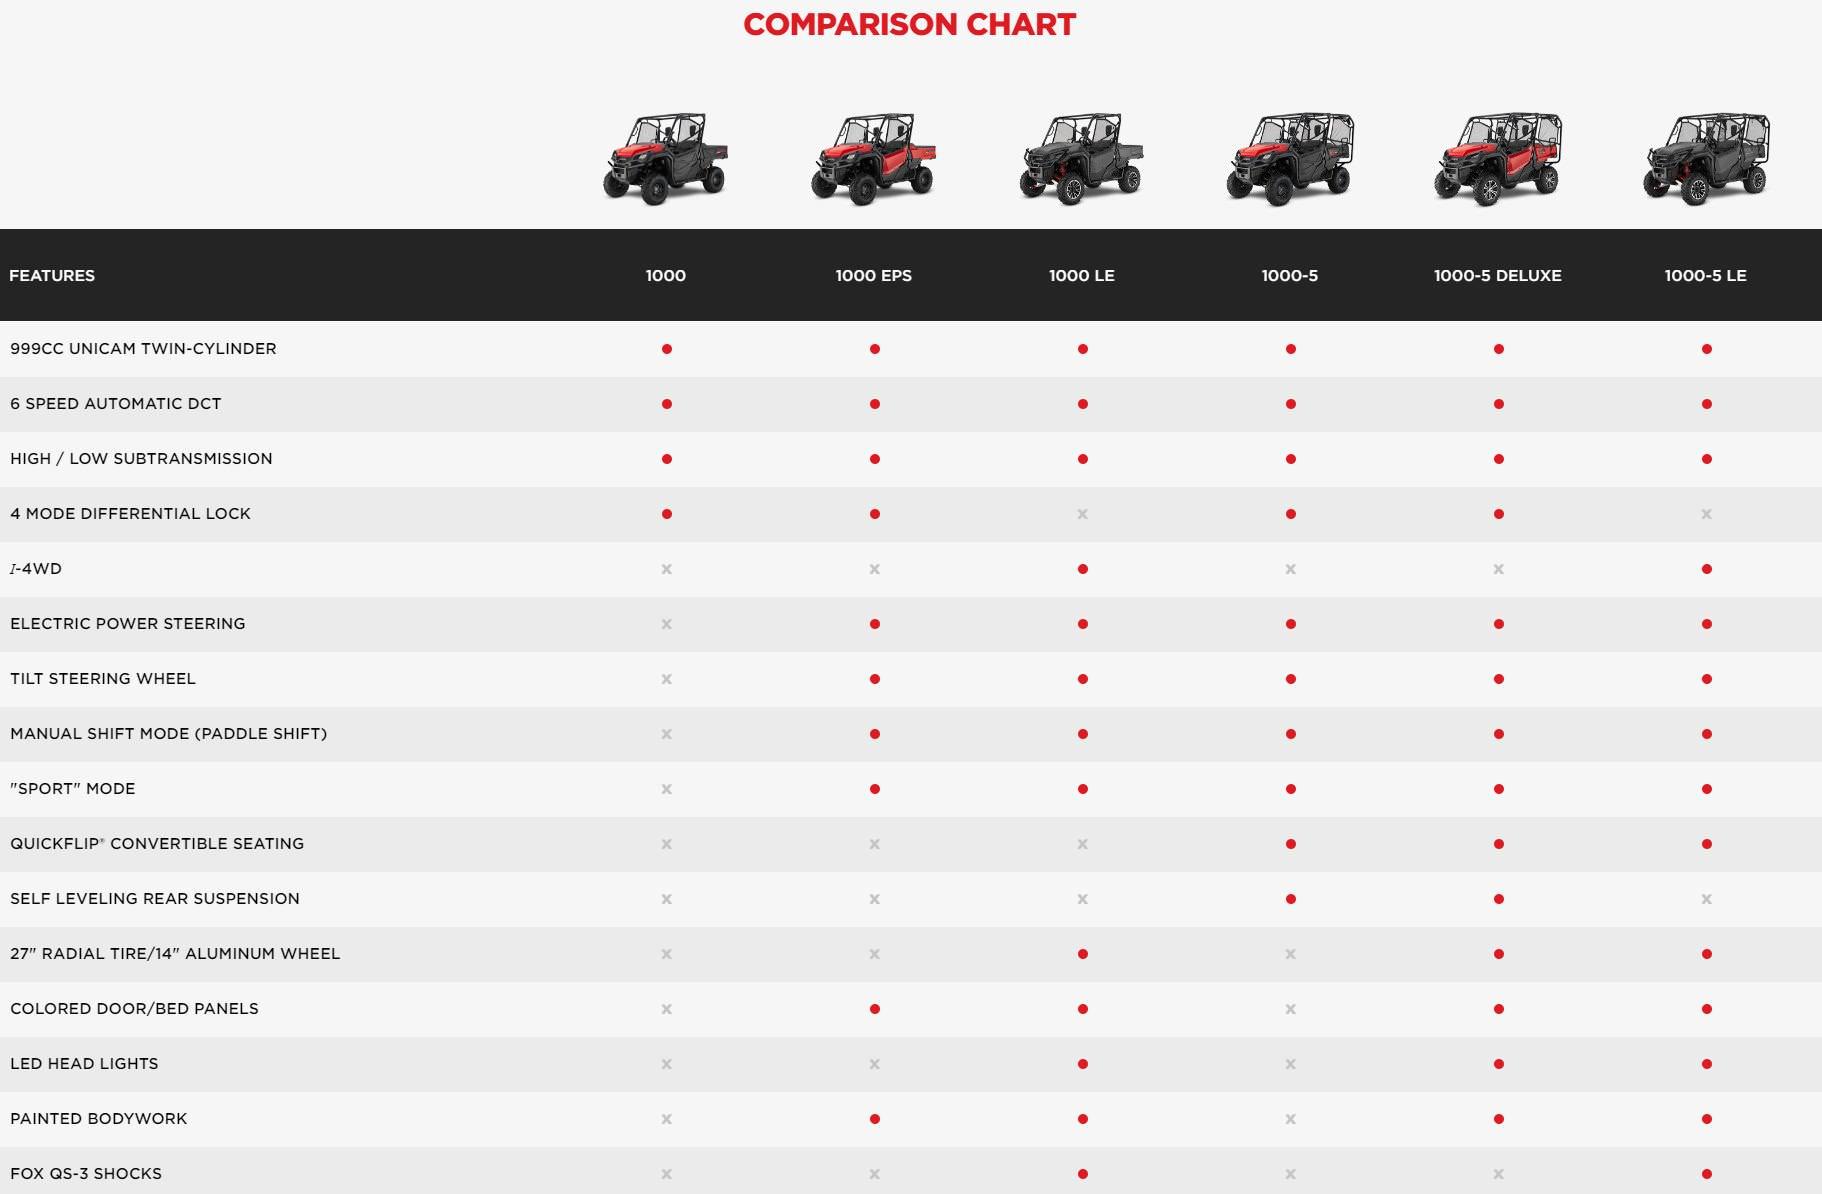 2017 Honda Pioneer 1000 Model Lineup Comparison Chart